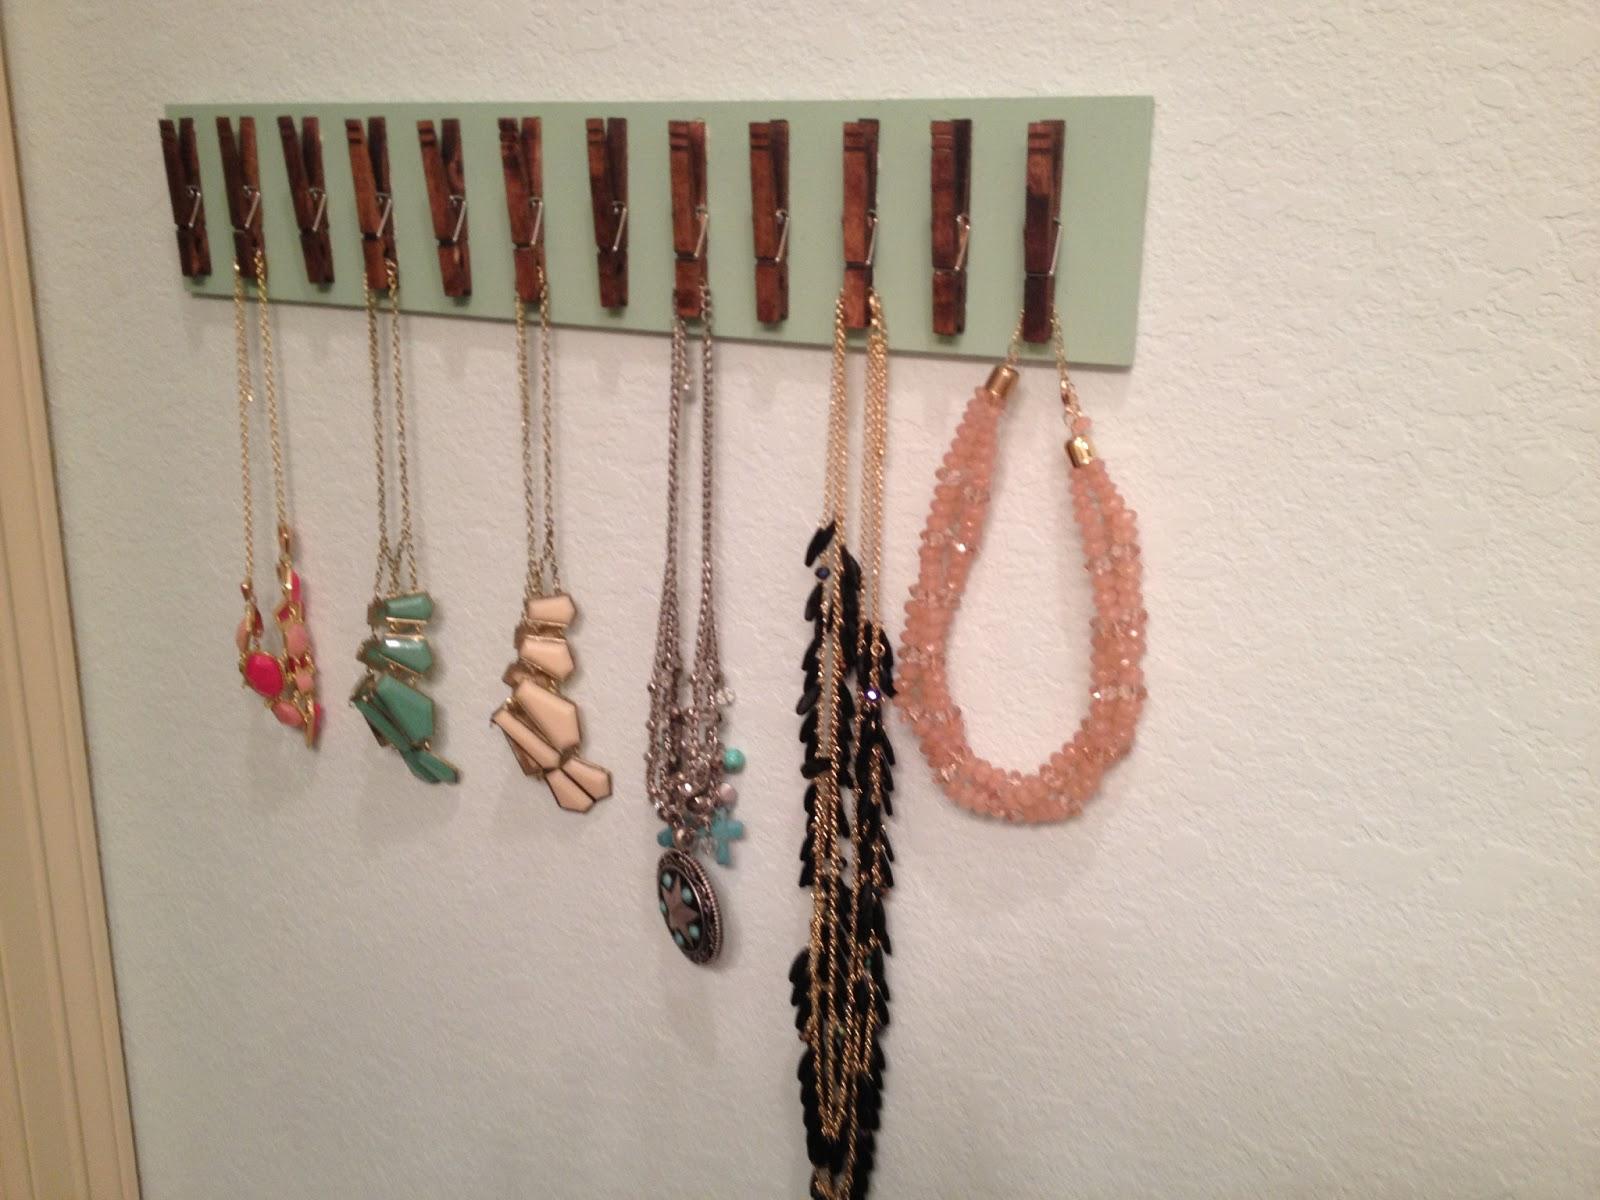 Diy Jewelry Holder Power Tools And High Heels Diy Jewelry Holder